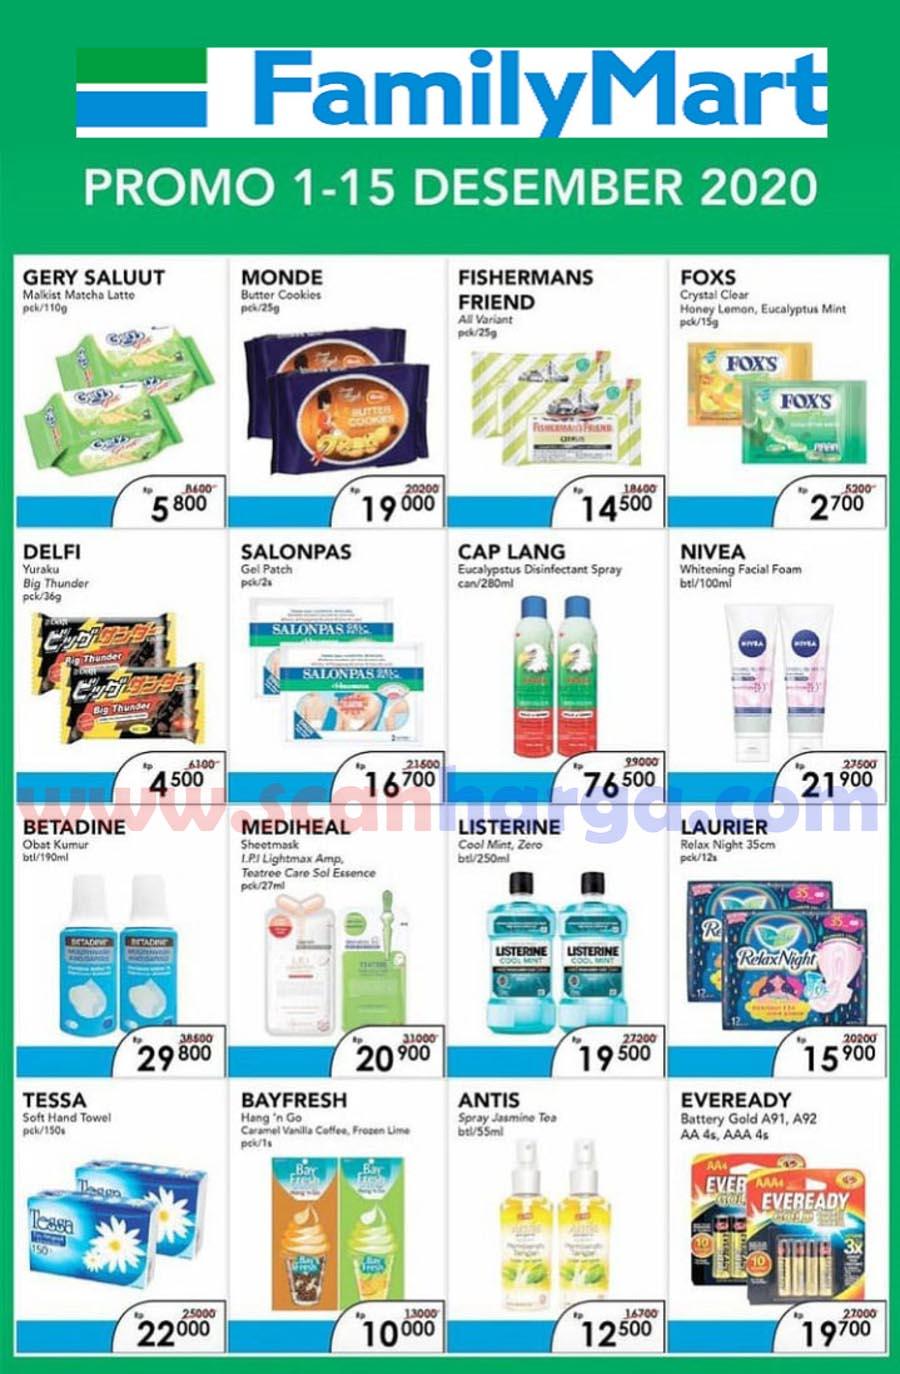 Katalog Promo Family Mart Periode 1 - 15 Desember 2020 2